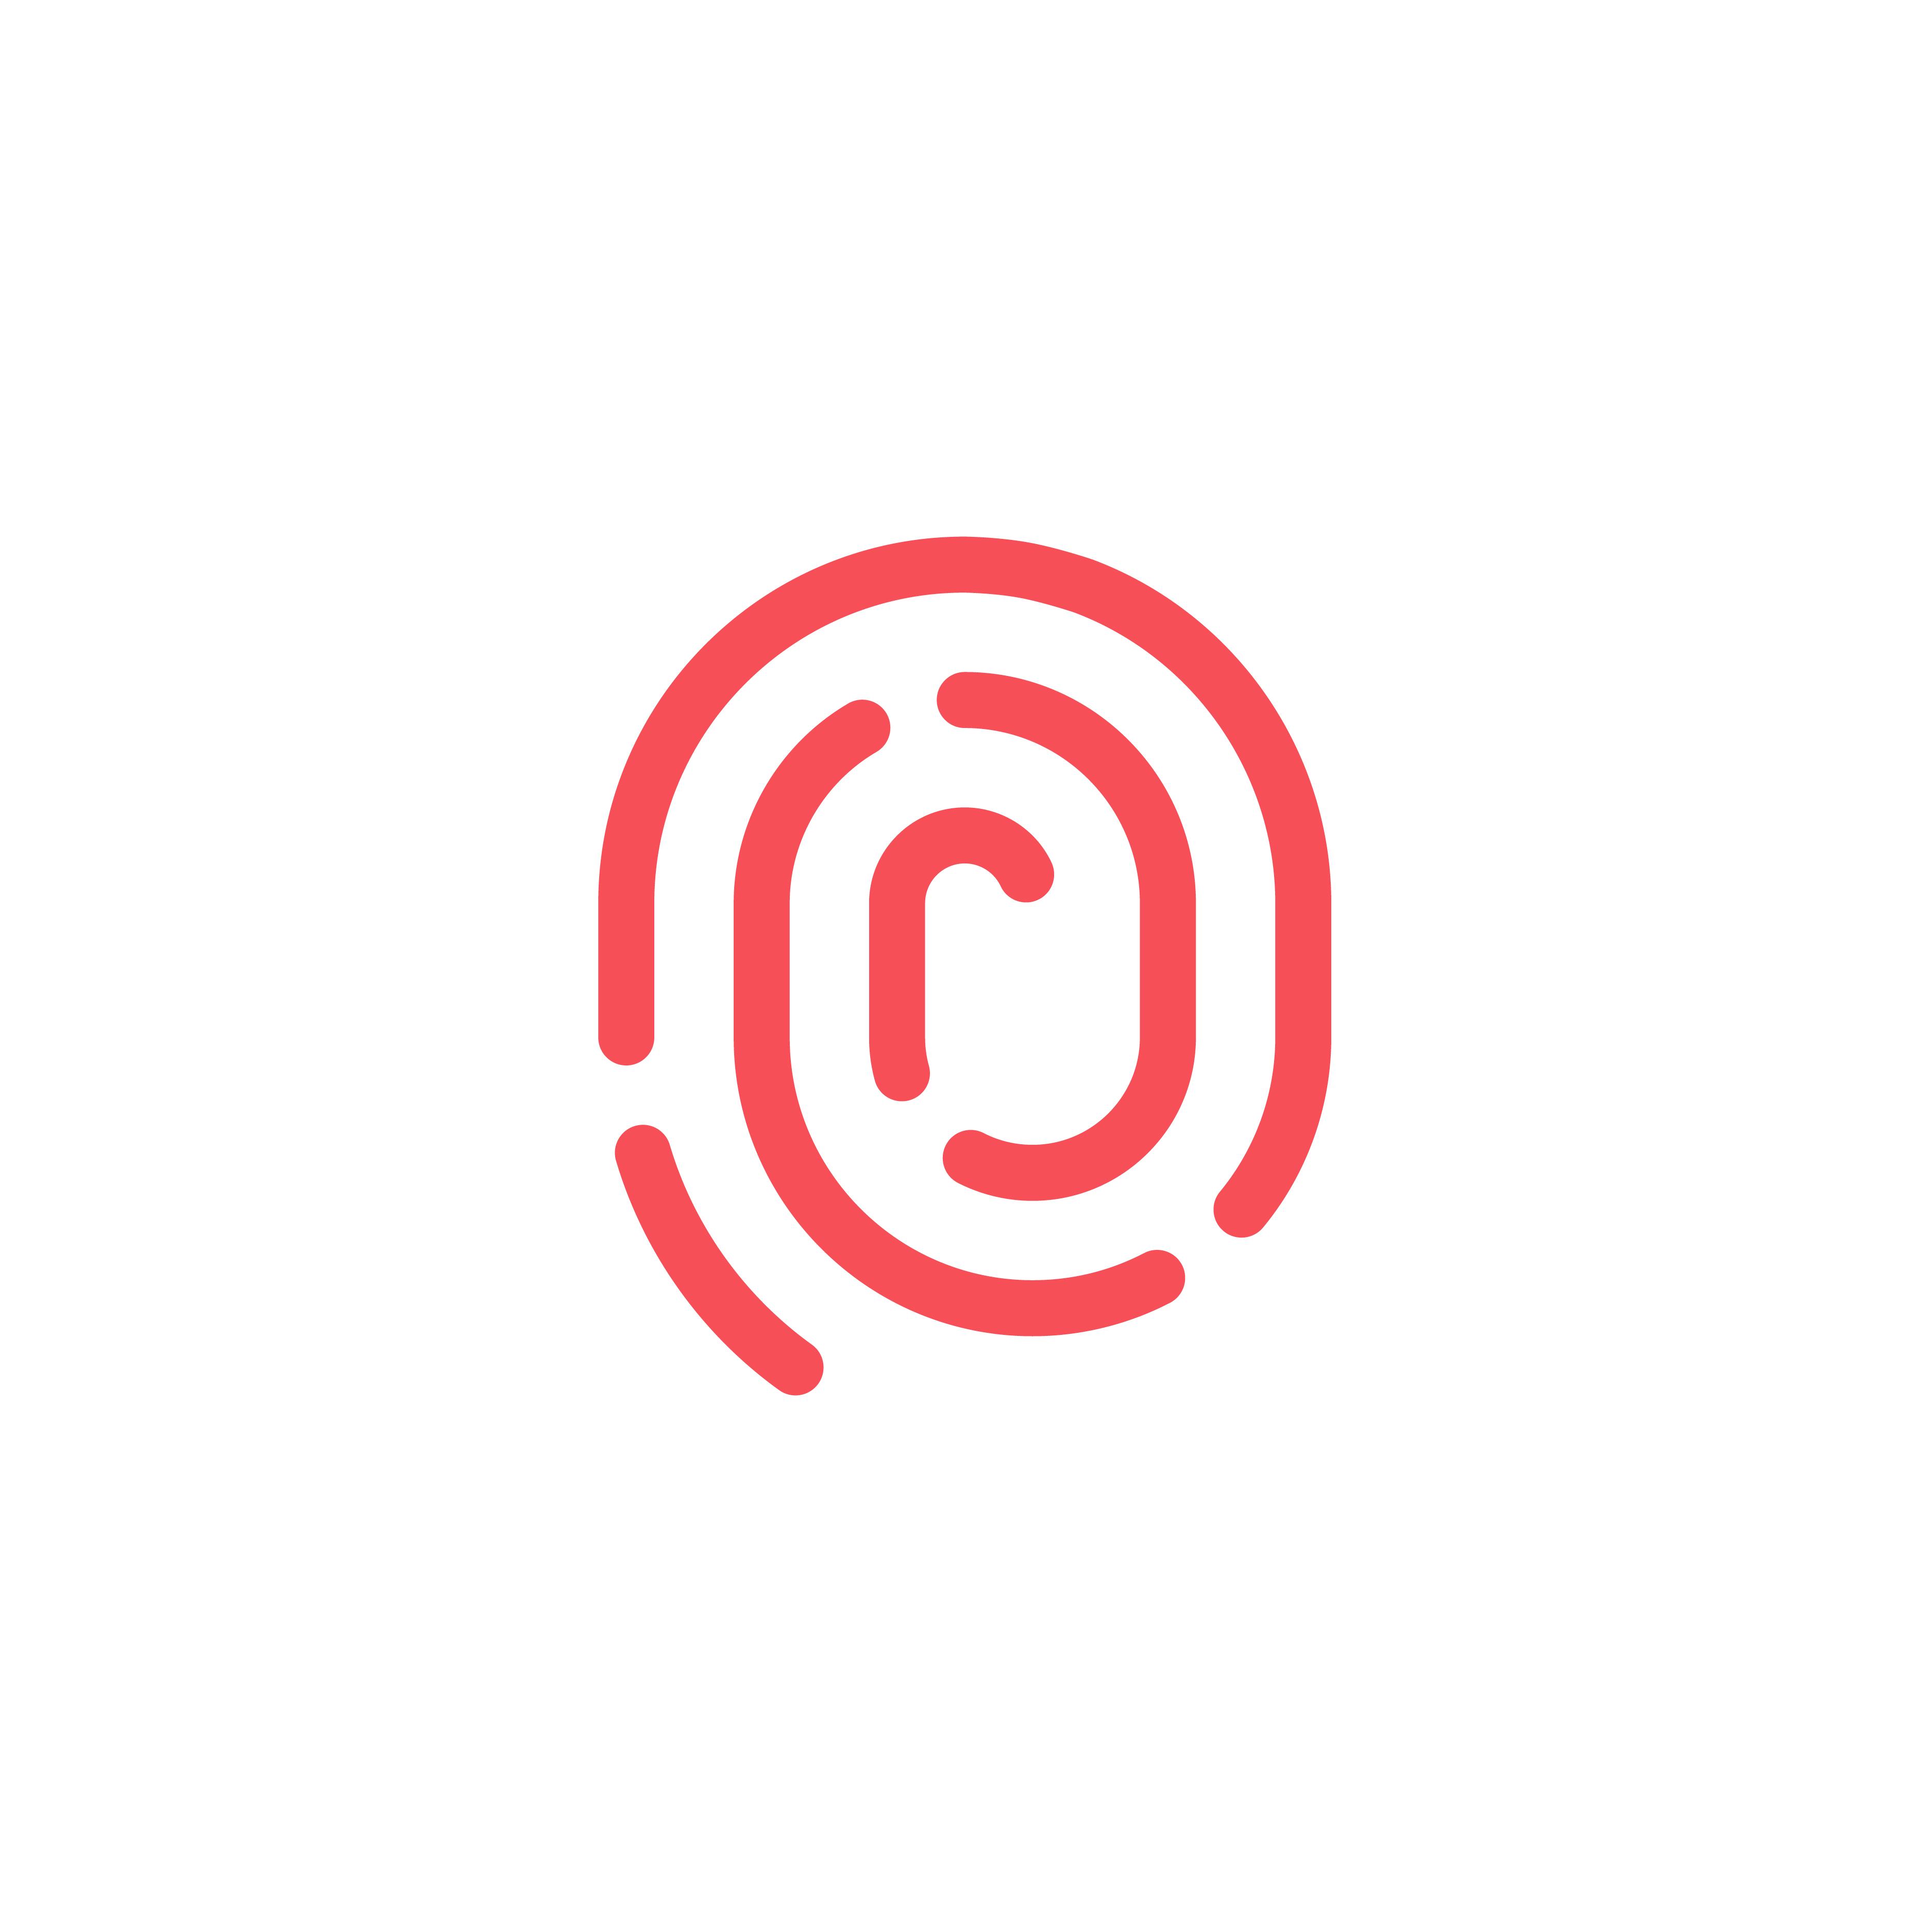 Redstamp logo design by logo designer brandclay